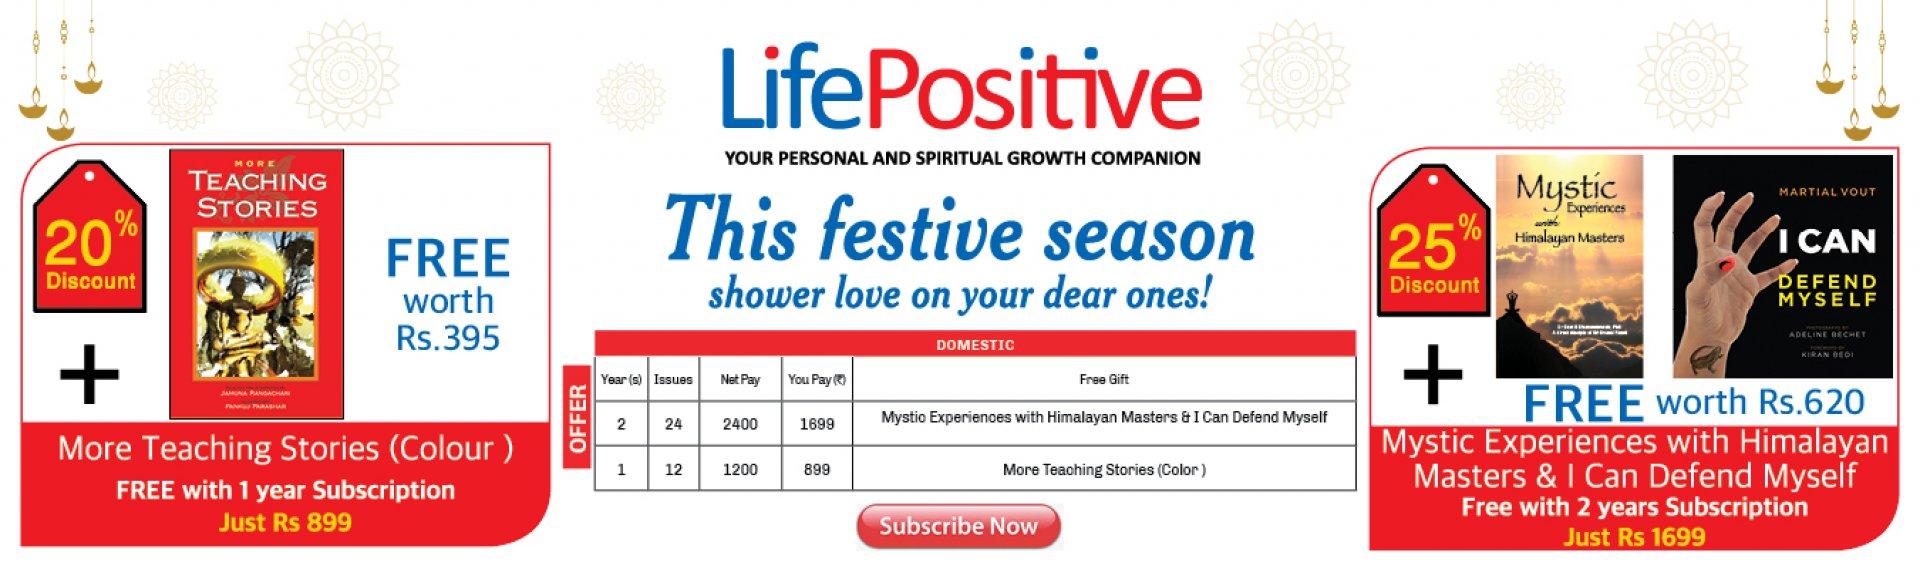 Life-Positive-Magazine-Festive-Offer